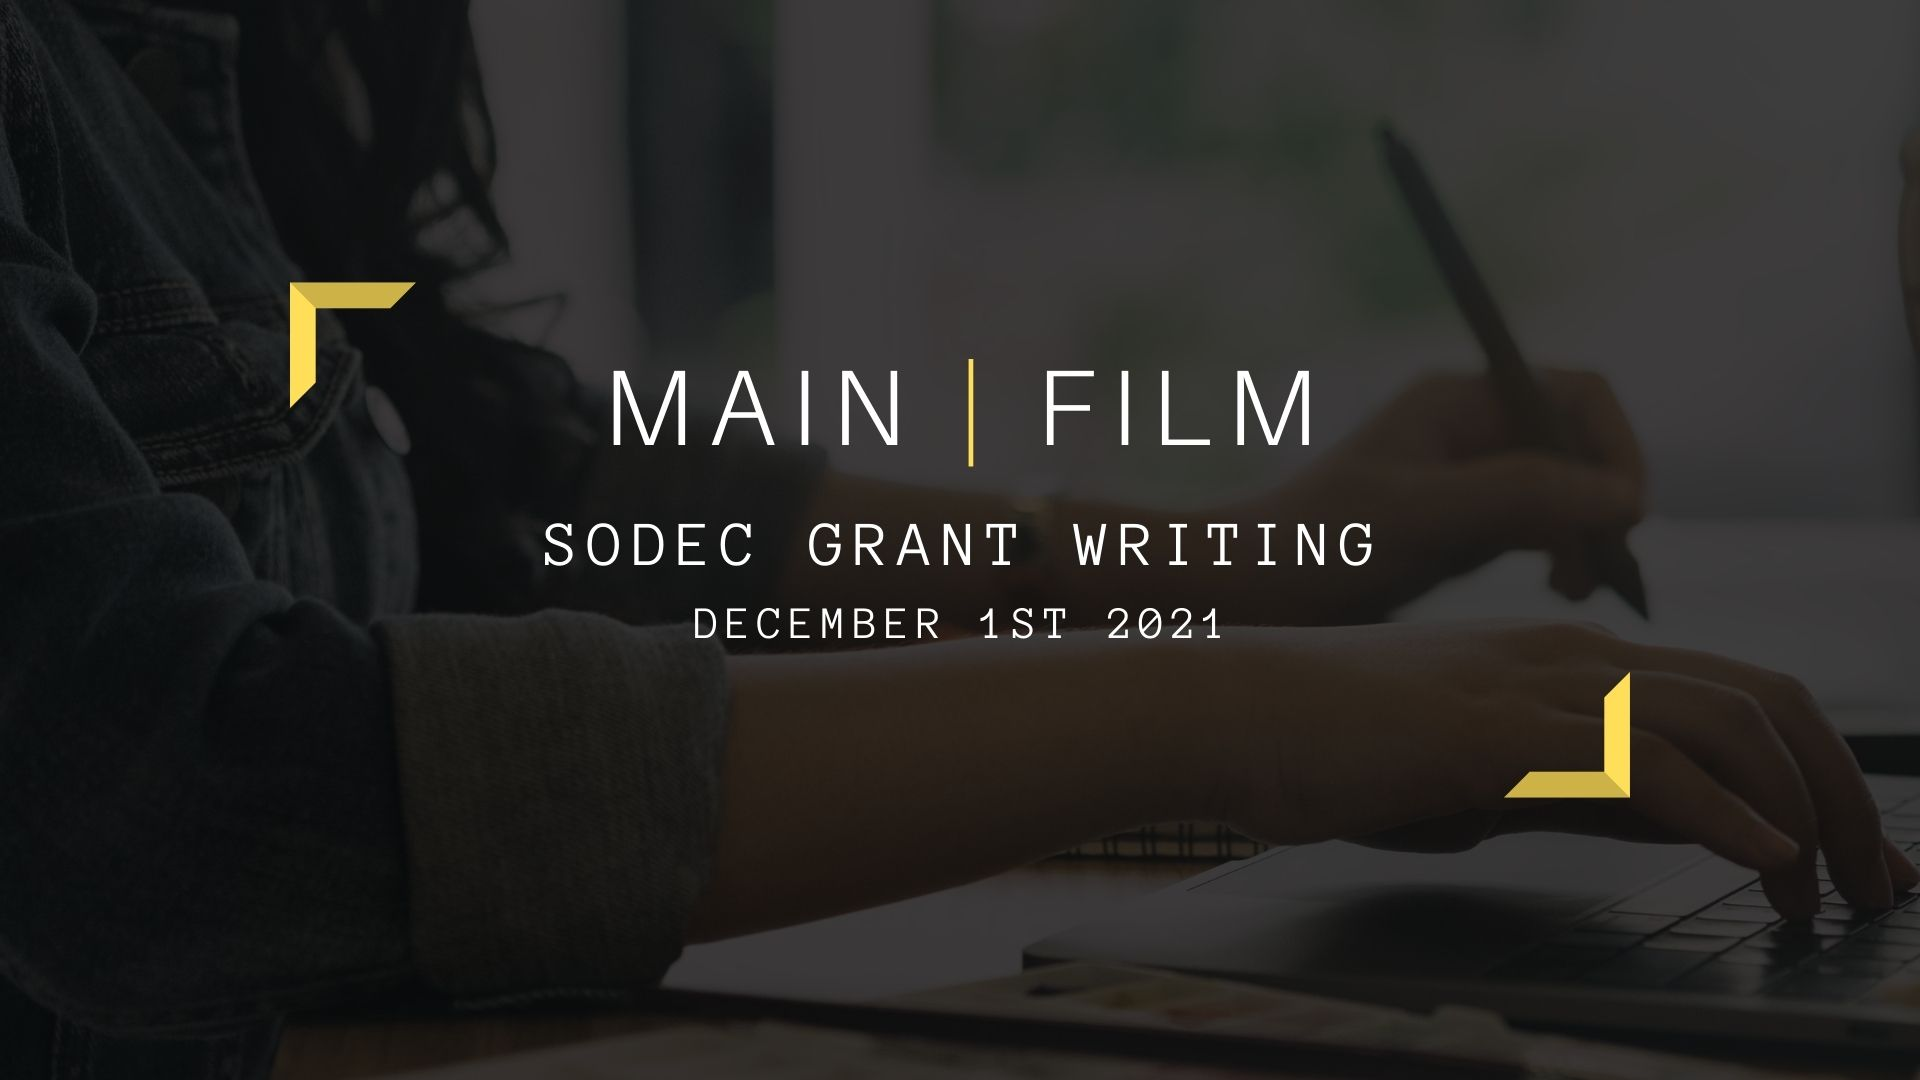 SODEC Grant Writing   Online